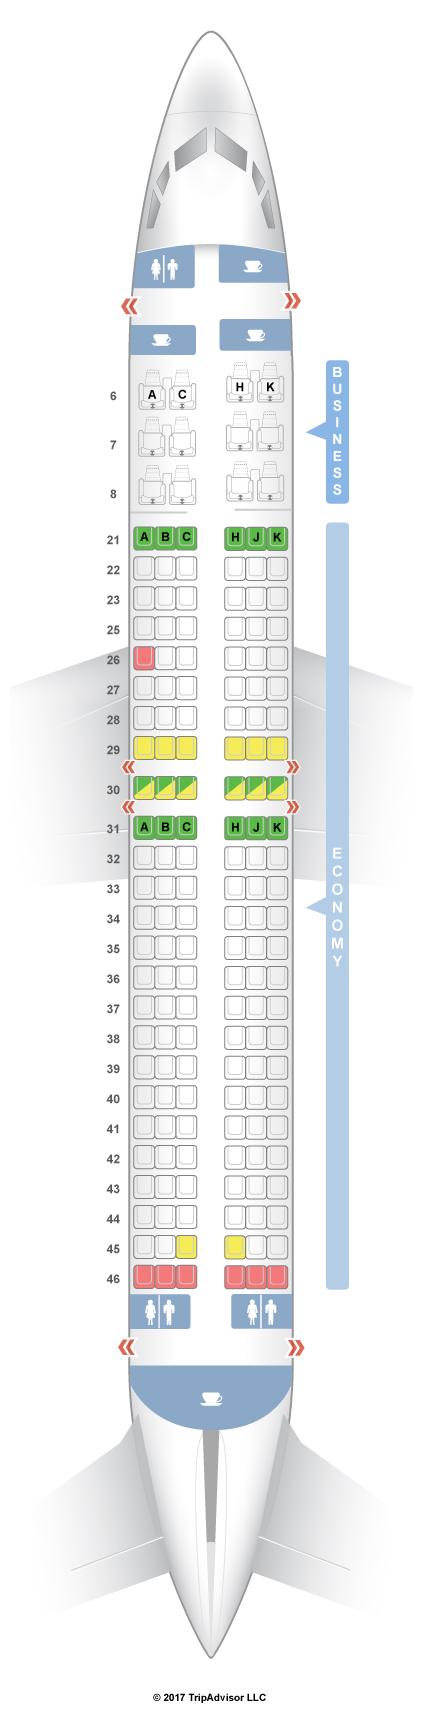 Franchise business plan malaysia flight